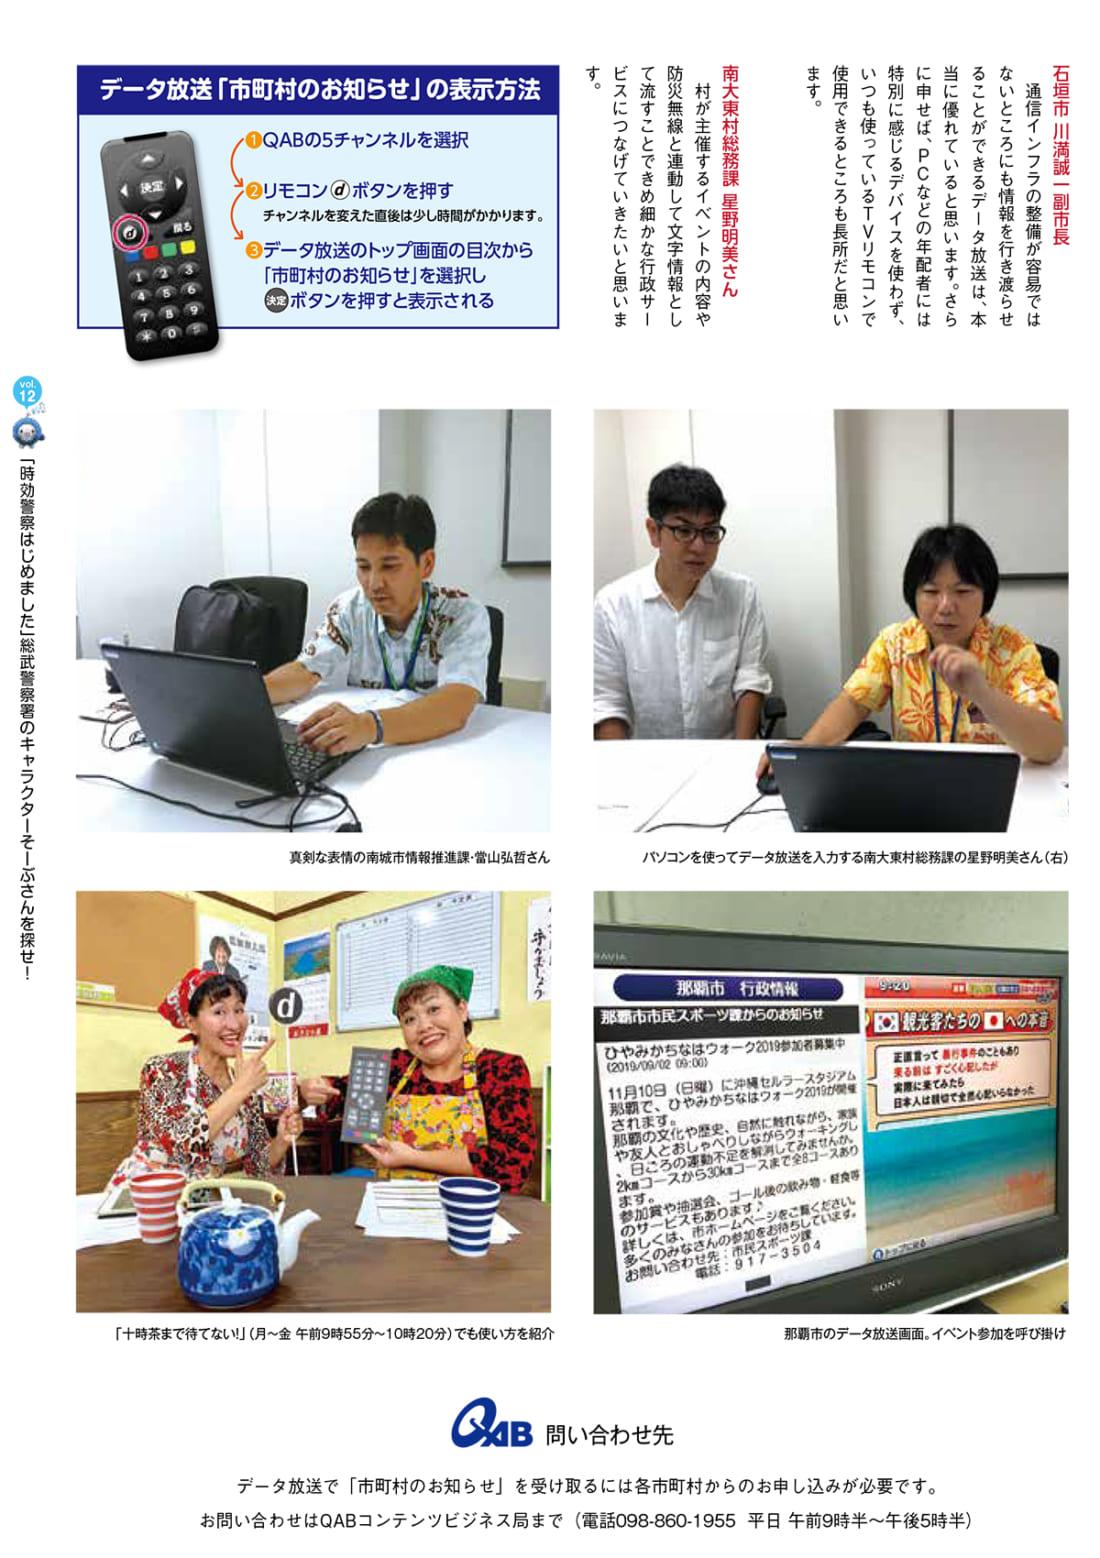 https://www.qab.co.jp/qgoro/wp-content/uploads/quun_1205-1100x1558.jpg